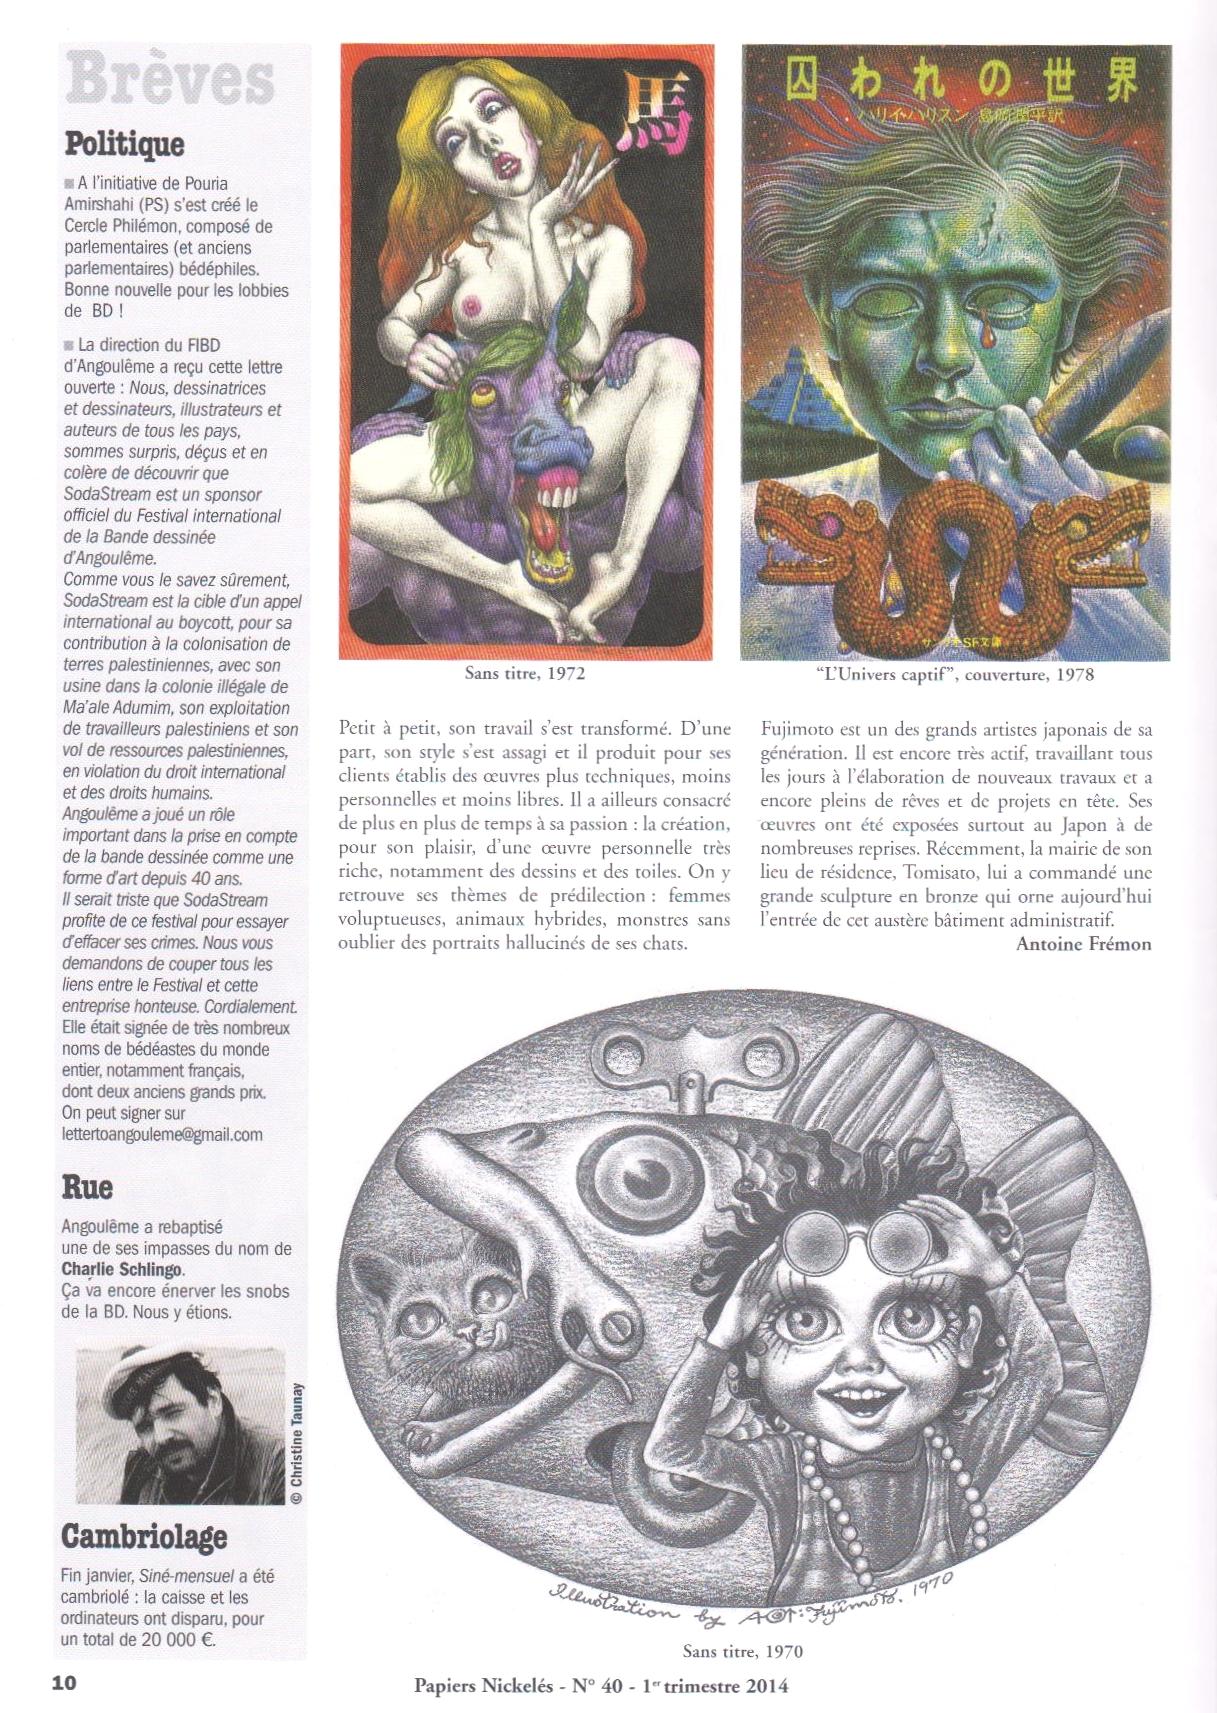 Fujimoto in Papiers Nickelès 2014 - page 2